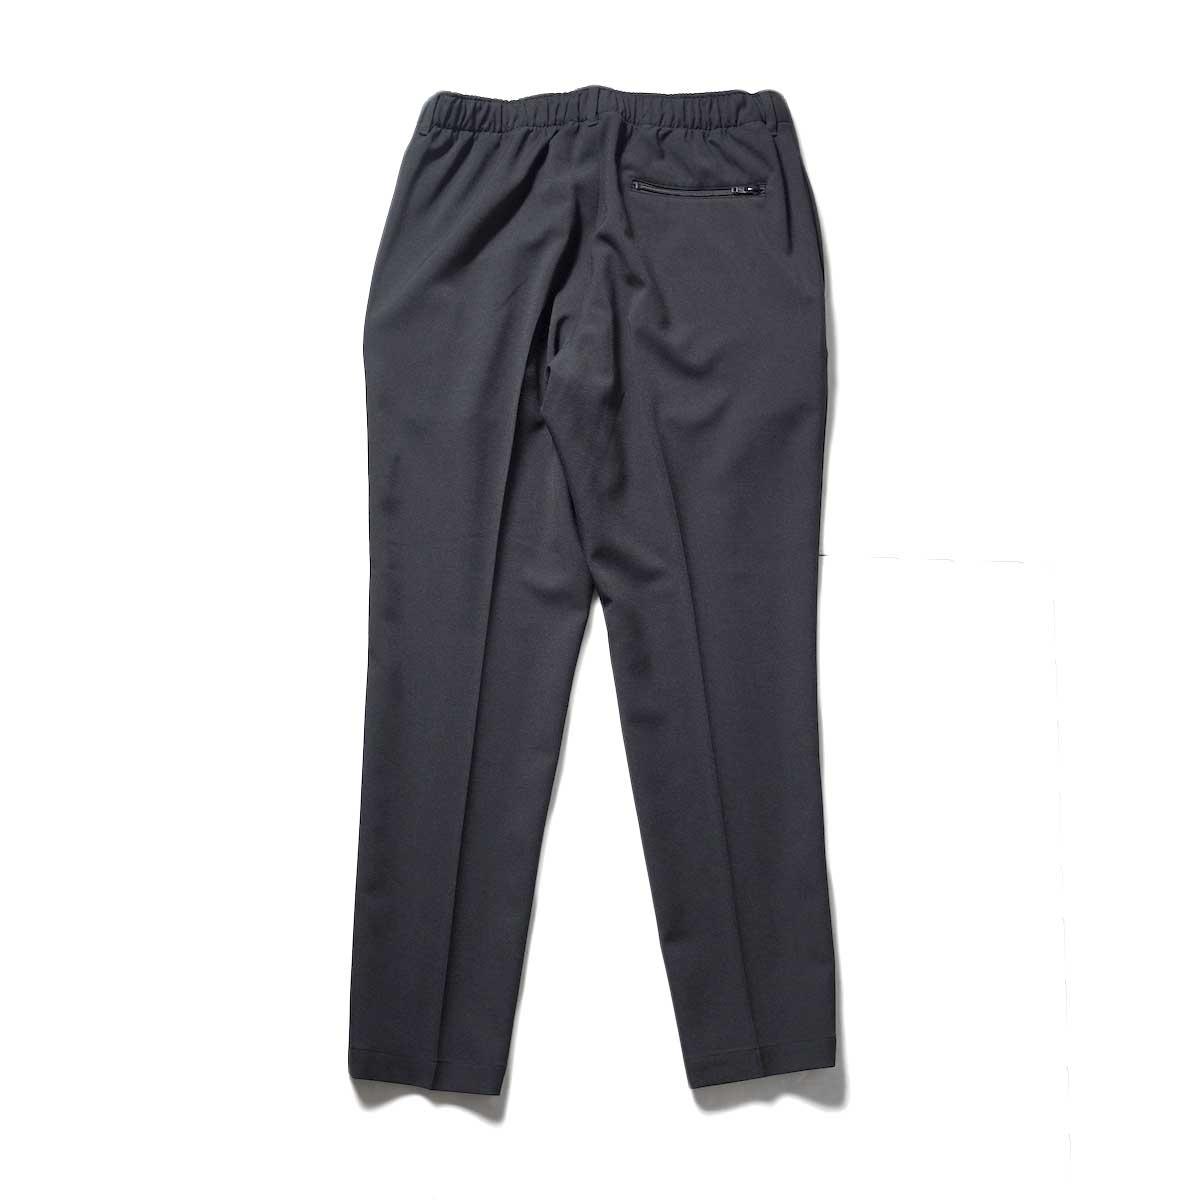 N.HOOLYWOOD / 2212-CP07-008 peg Tapered Easy Pants (Black)背面